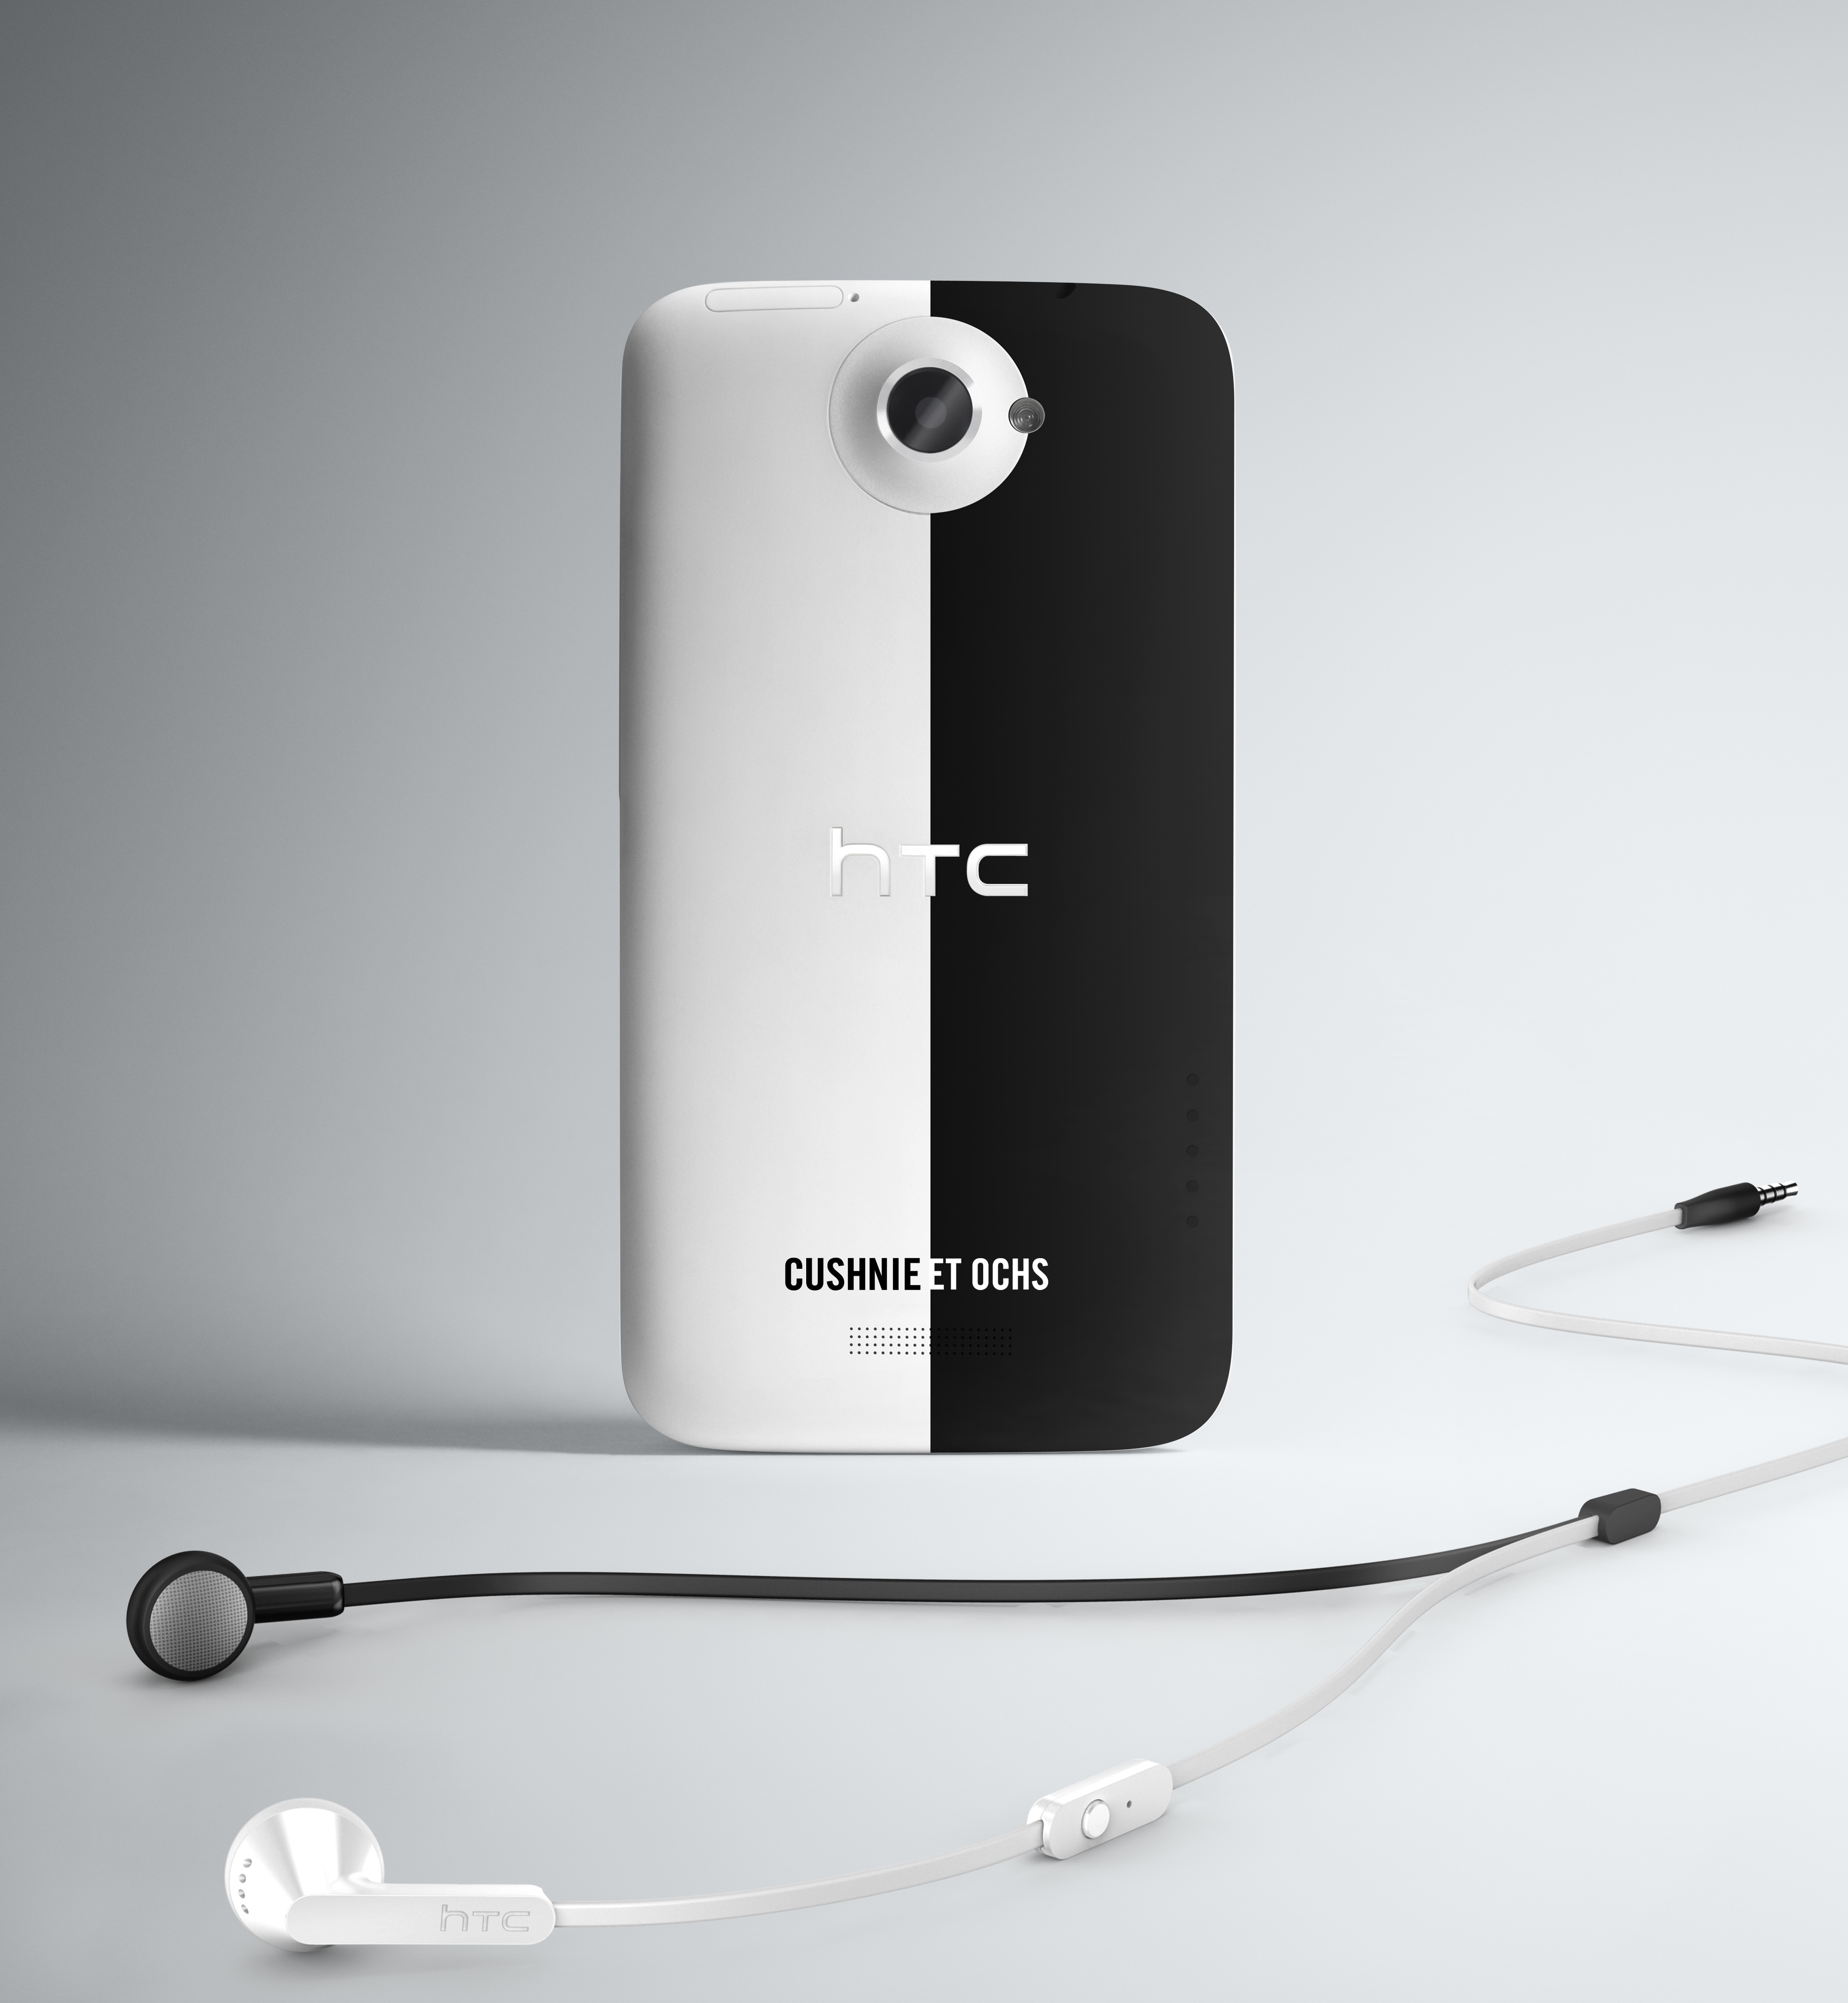 The 2 Tone HTC One X By Cushnie et Ochs Is Fashionably Chic